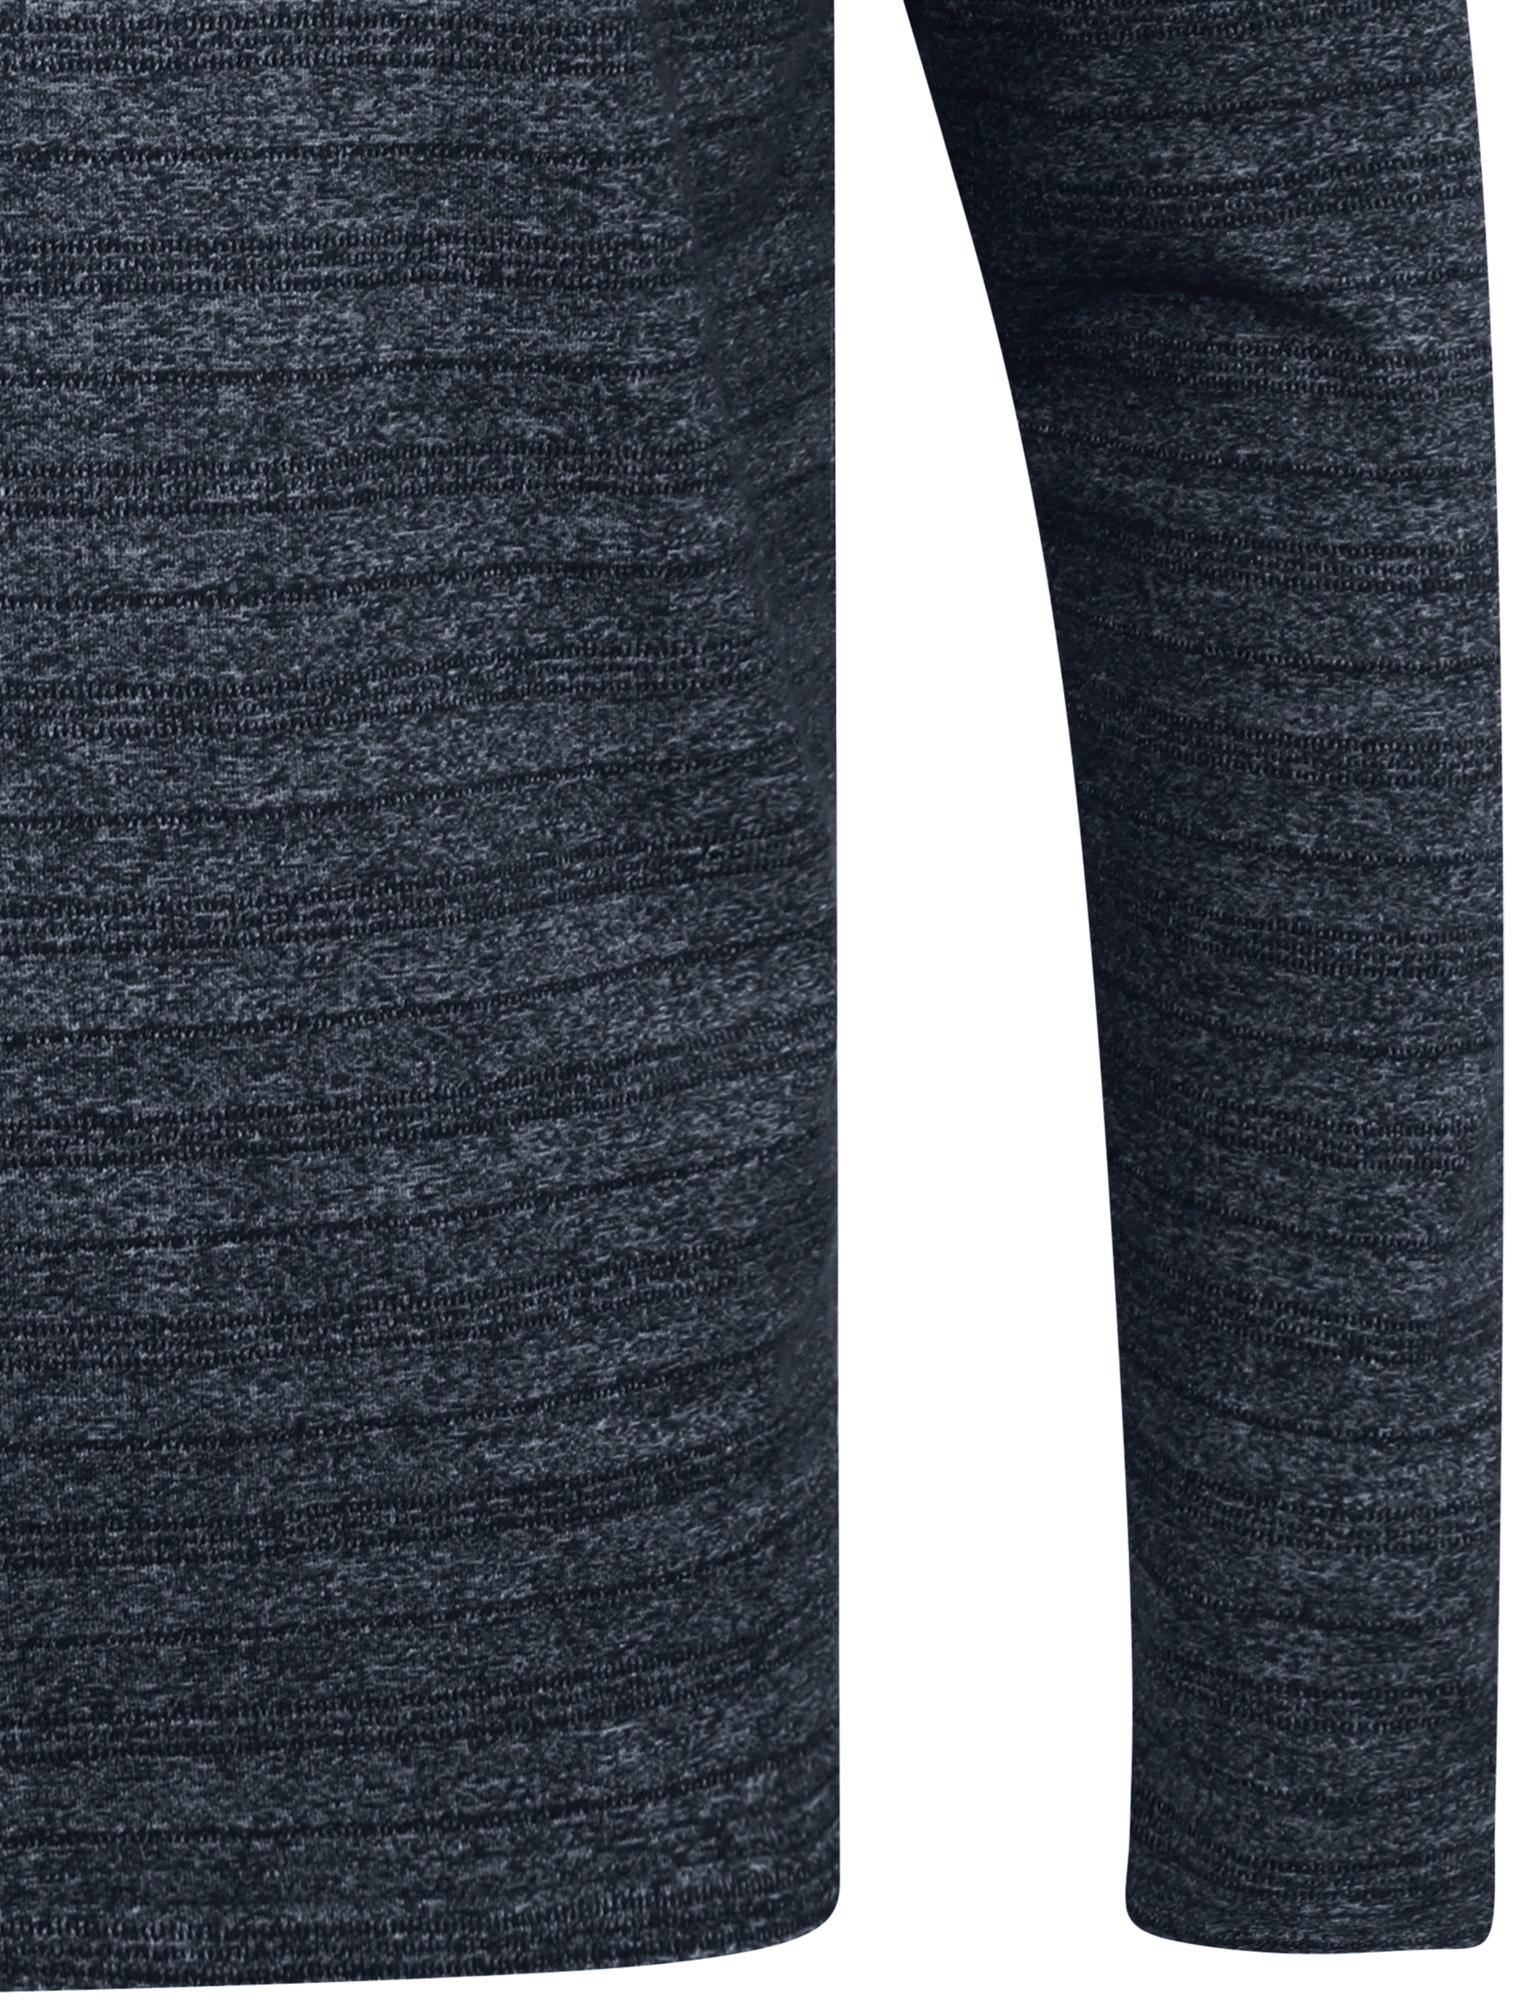 Tokyo-Laundry-Men-Hoaden-Crew-Neck-Long-Sleeve-T-Shirt-Top-Henley-Grandad-Collar thumbnail 5